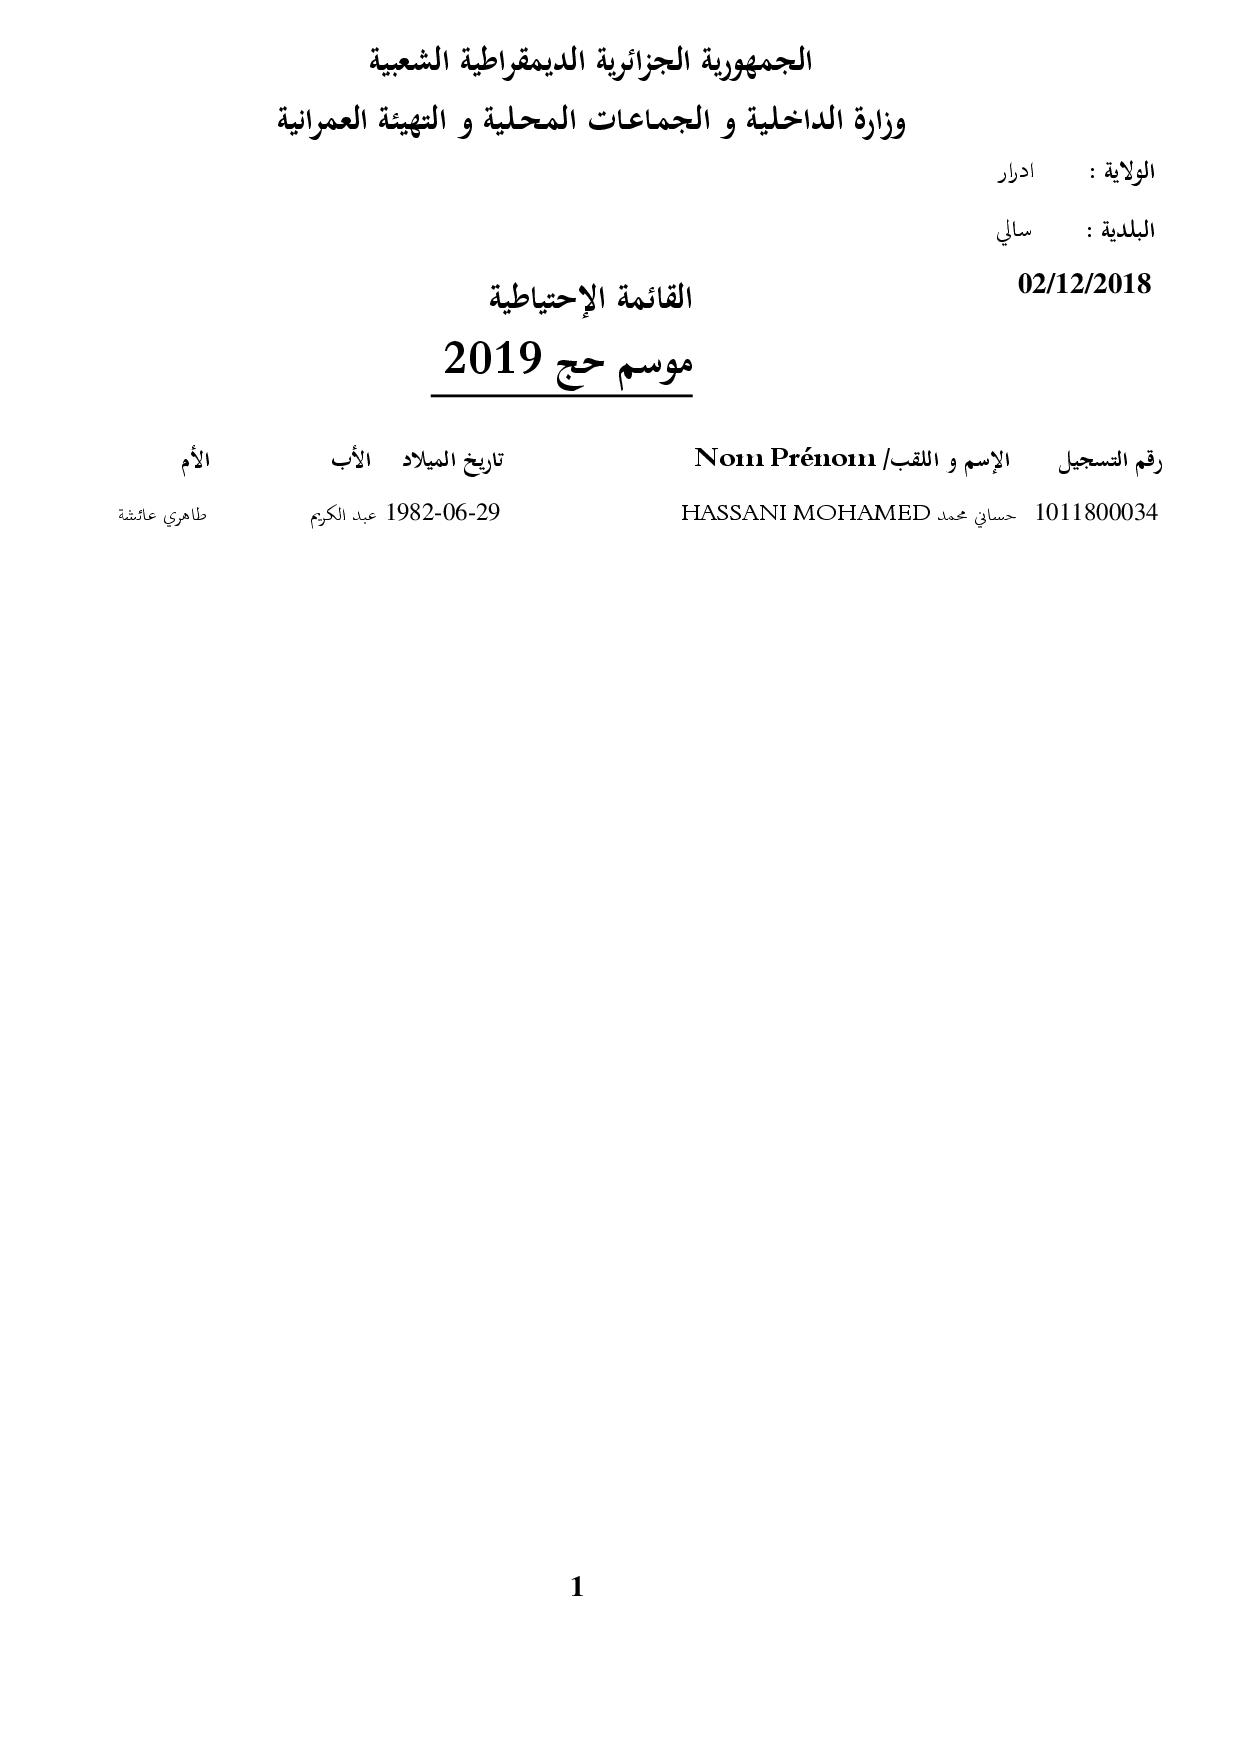 hadj22019.jpg